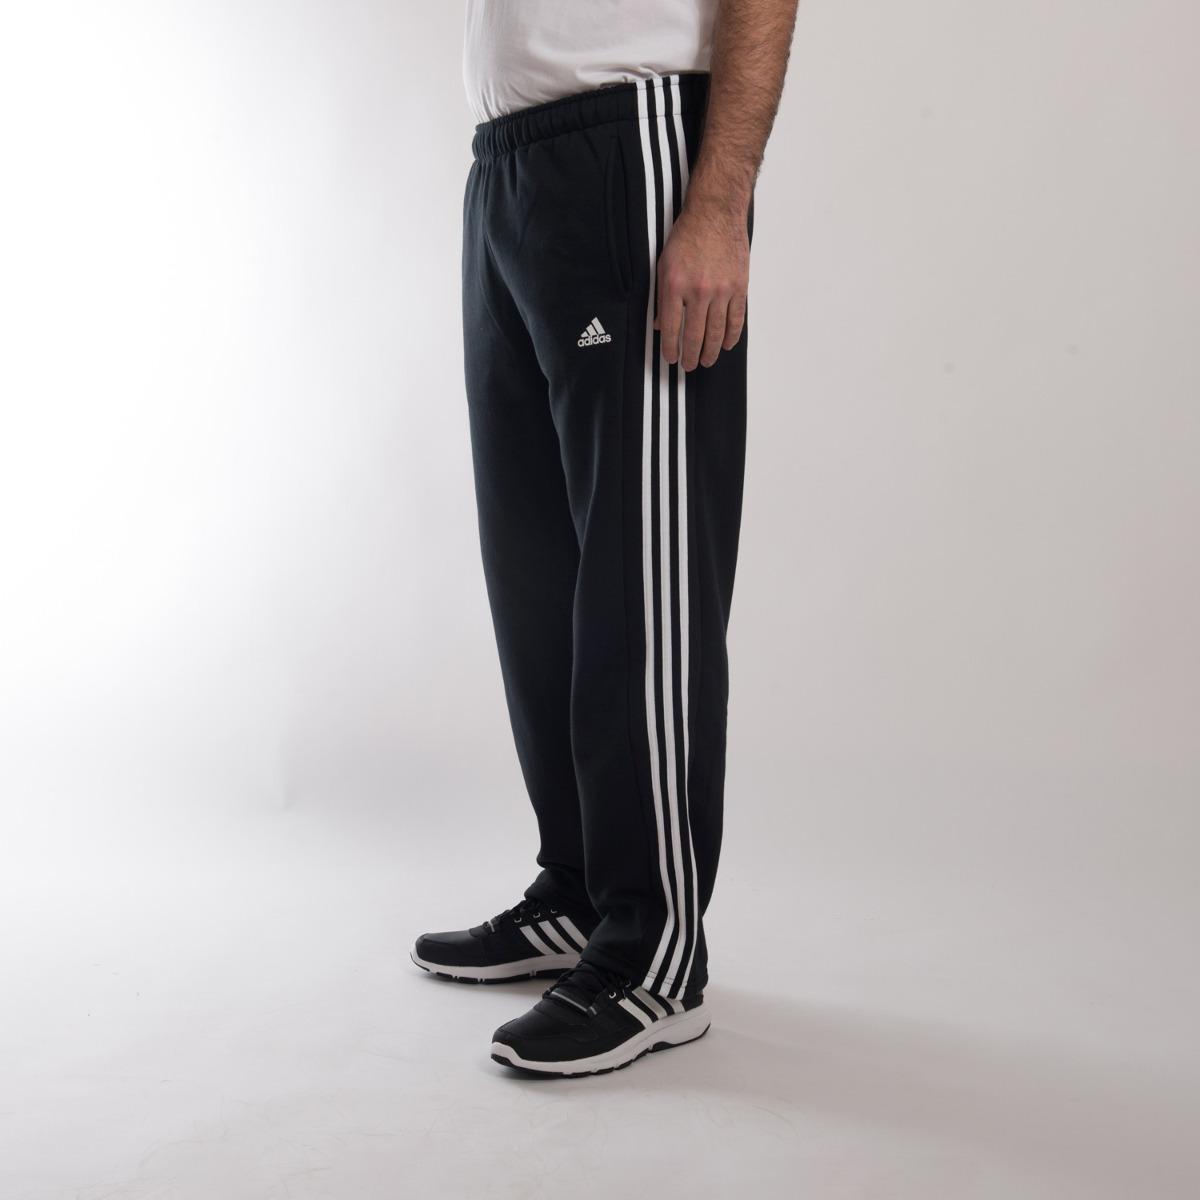 En Pantalon Sports 00 Adidas Co Pant Open 999 Ess 3s Ai6812 AvOAwUqx